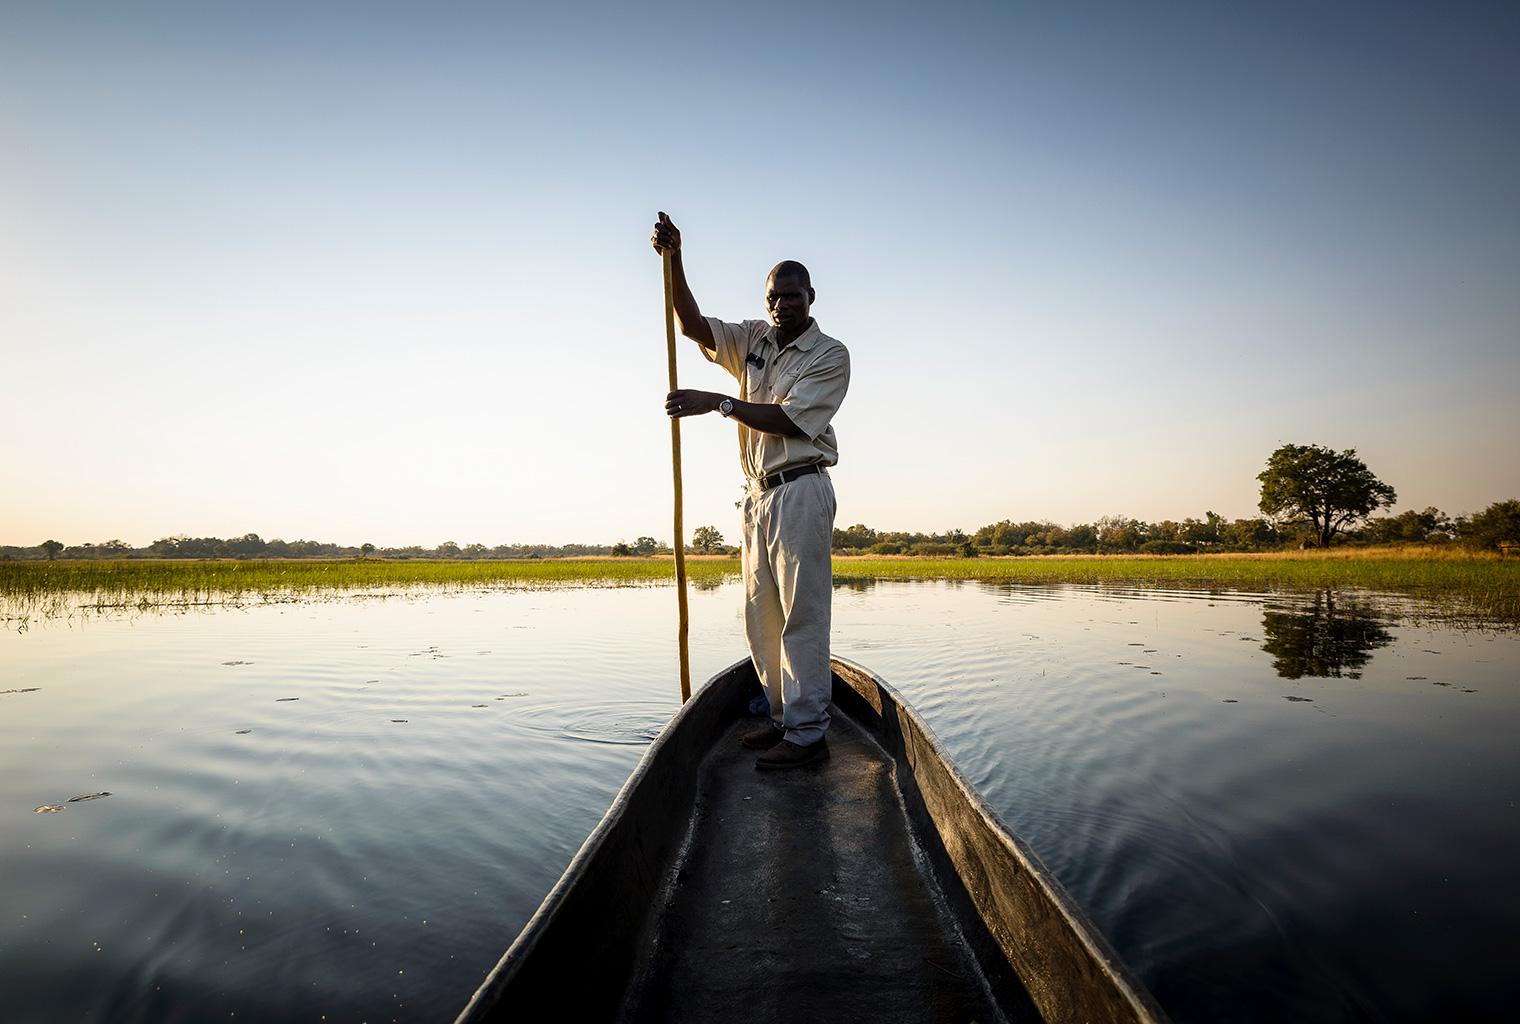 Chiefs-CampBotswana-Boat